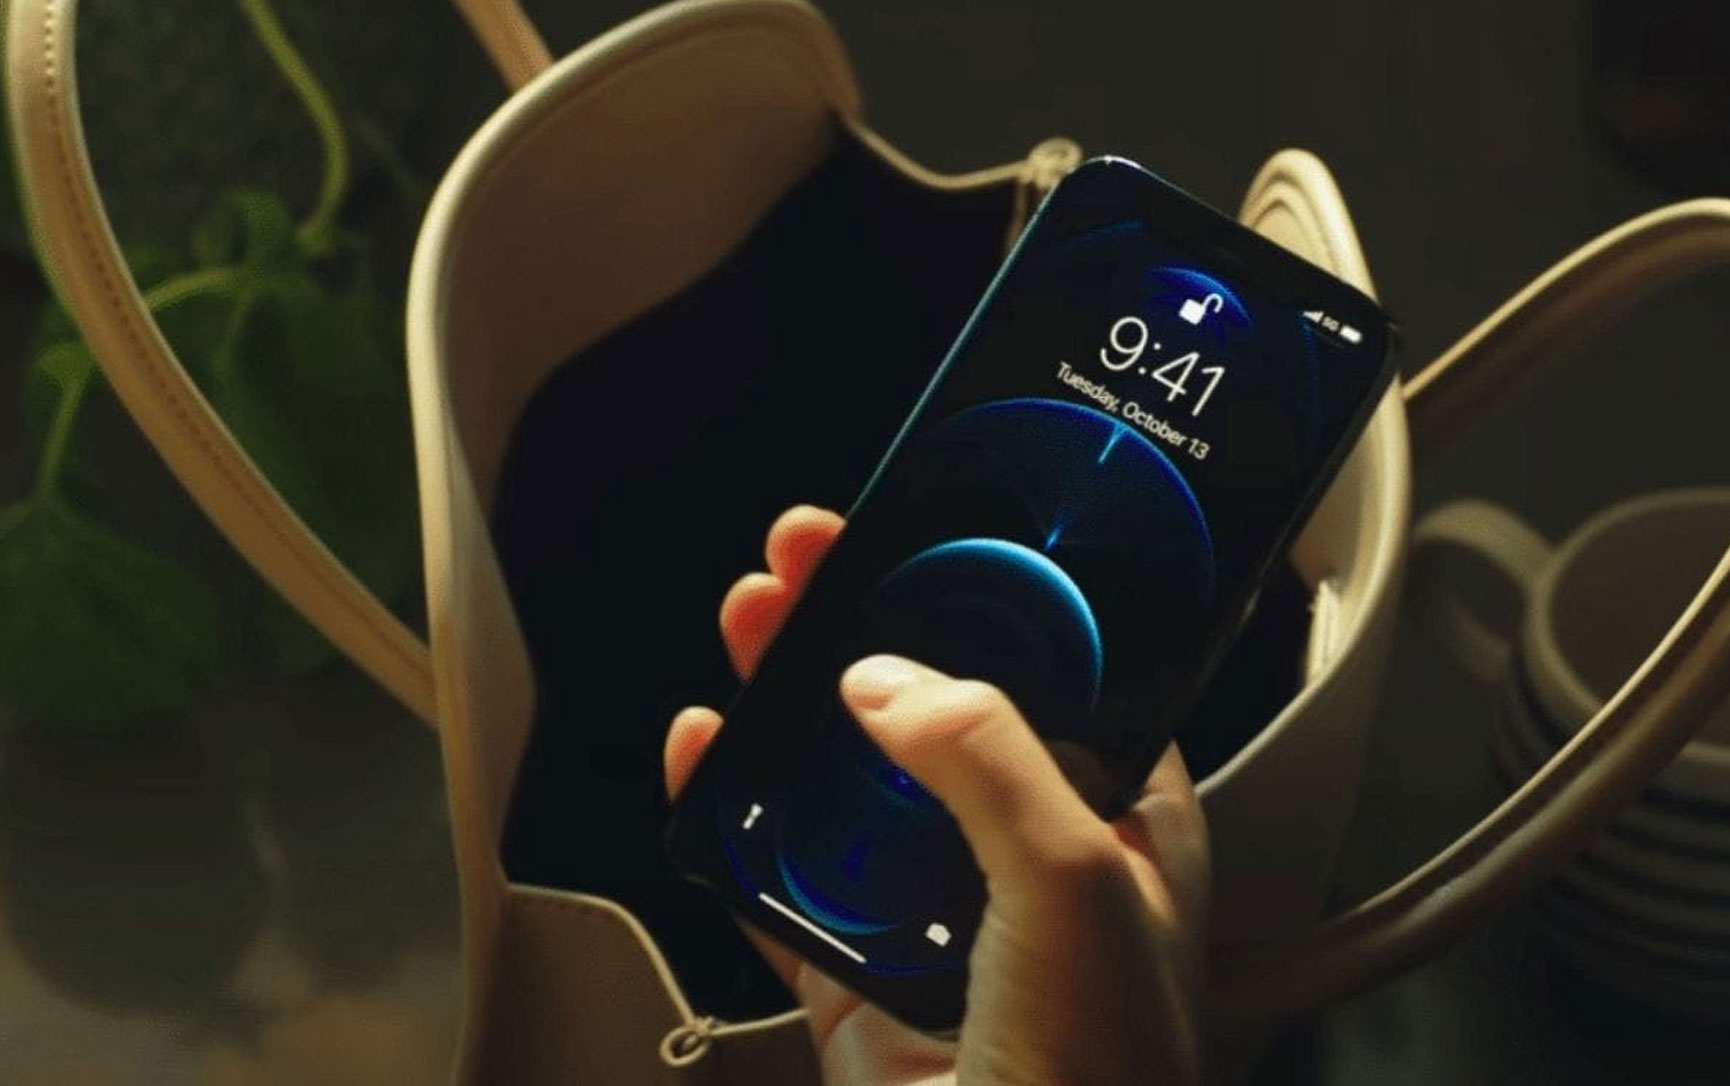 Apple VR headset plans progress as company tests 3,000 dpi display